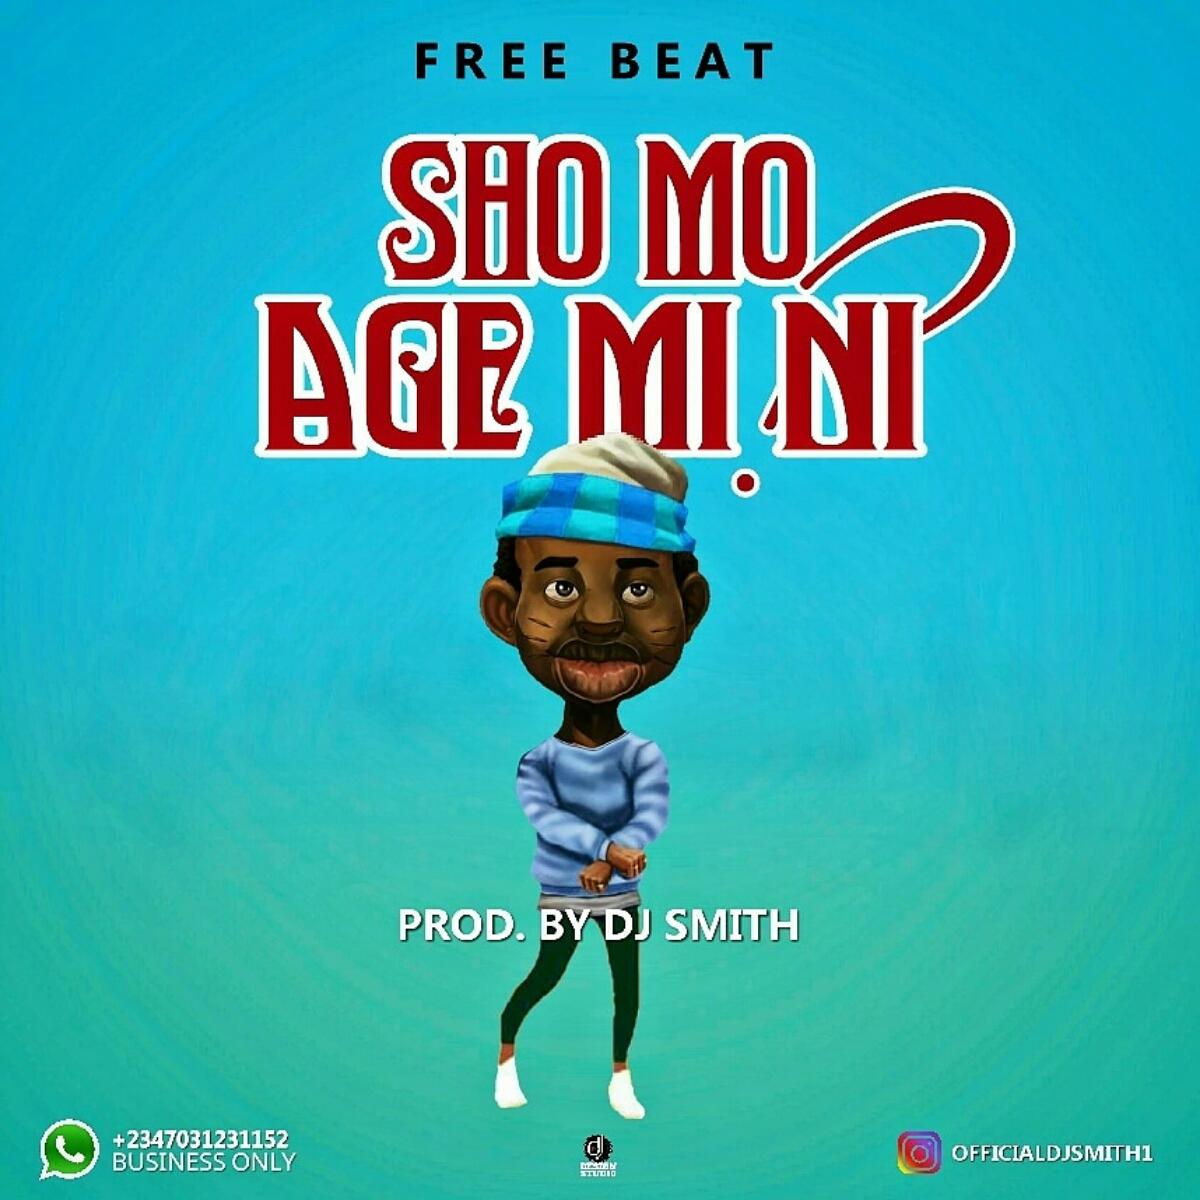 Download Freebeat:- Sho Mo Age Mi Ni (Prod By DJ Smith) - 9jaflaver